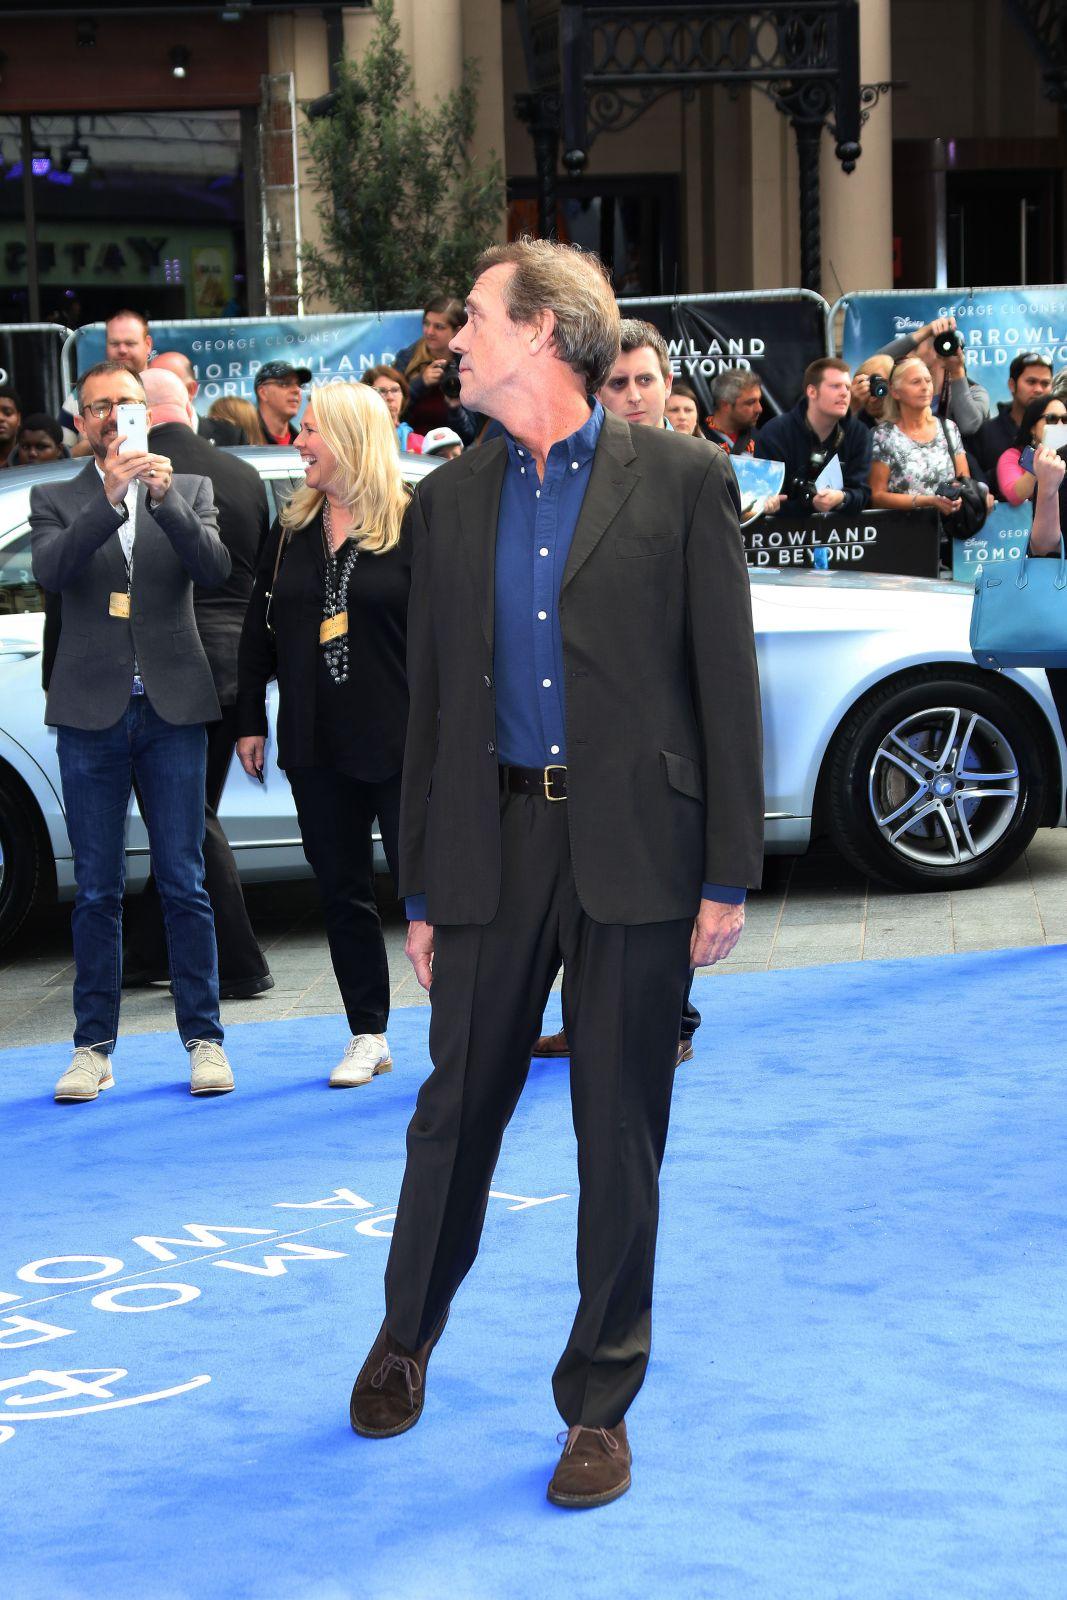 Hugh Laurie61 - Tomorrowland Premiere London 2015.jpg